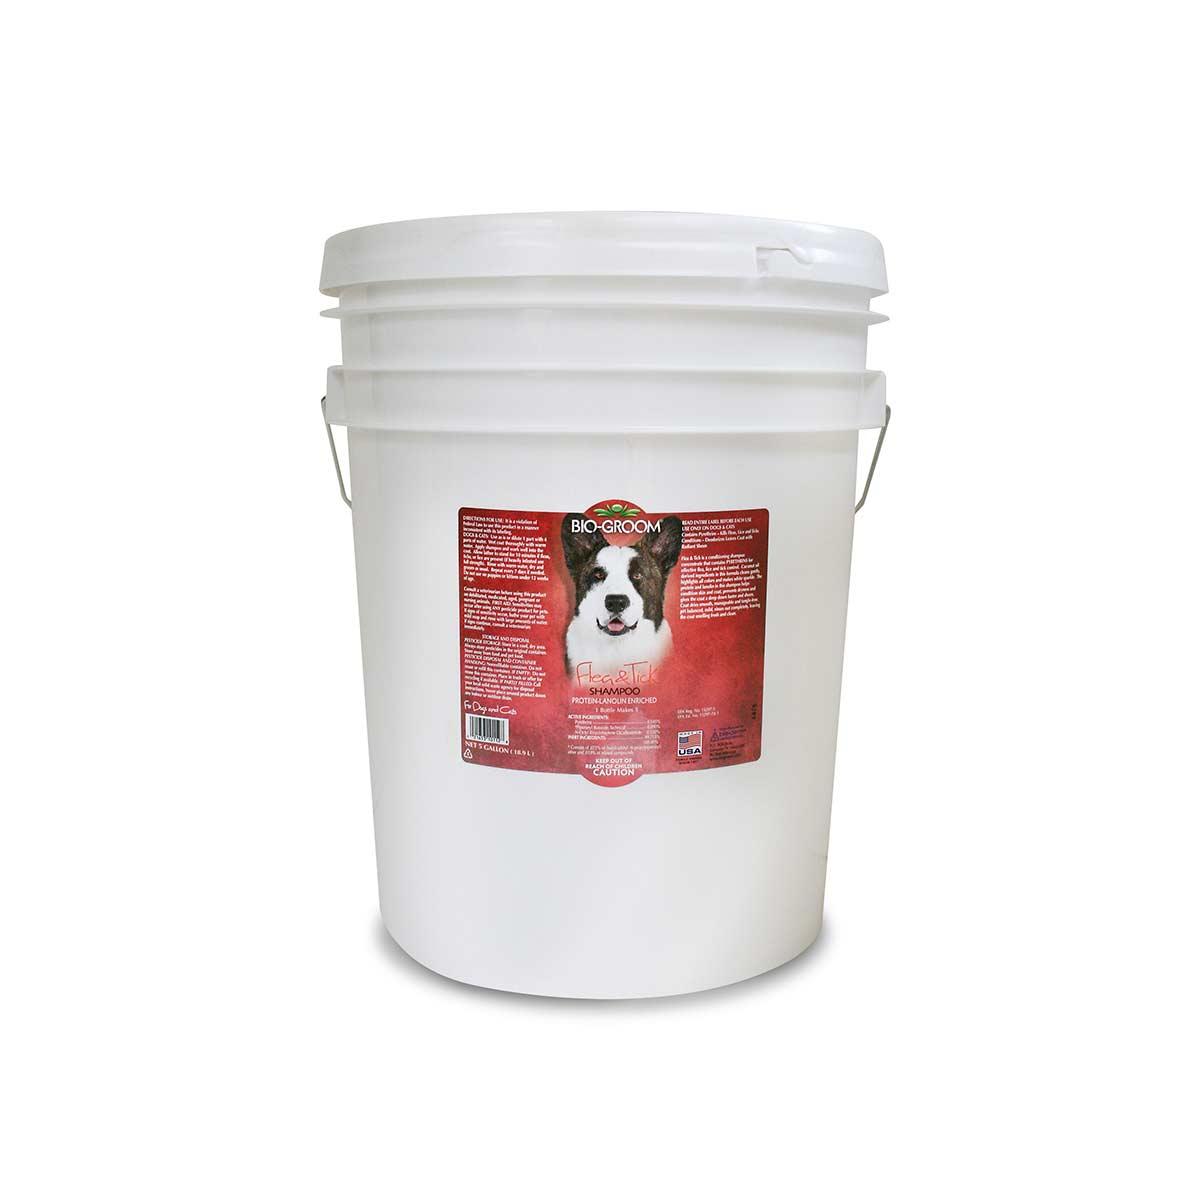 5 Gallon 4:1 Bio-Groom Flea & Tick Dog Shampoo for Grooming